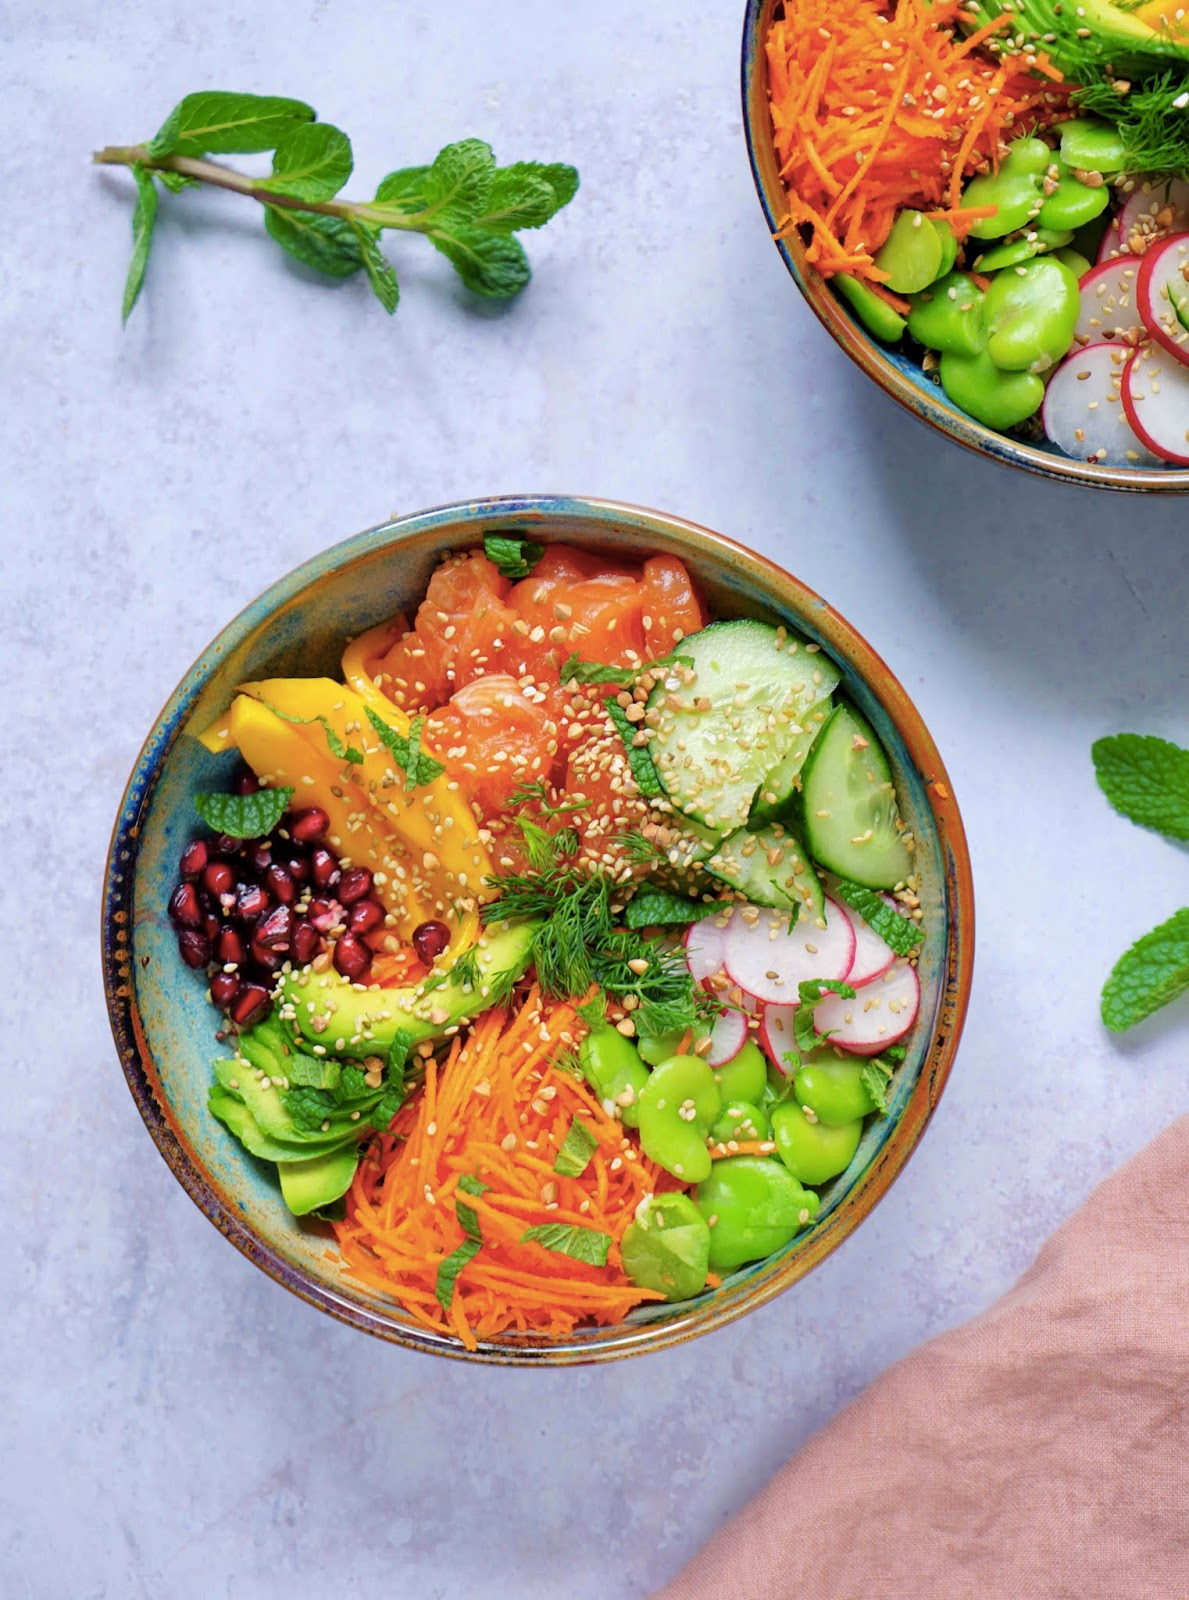 healthy food , saumon cru , legumes , quinoa , plat complet recette facile